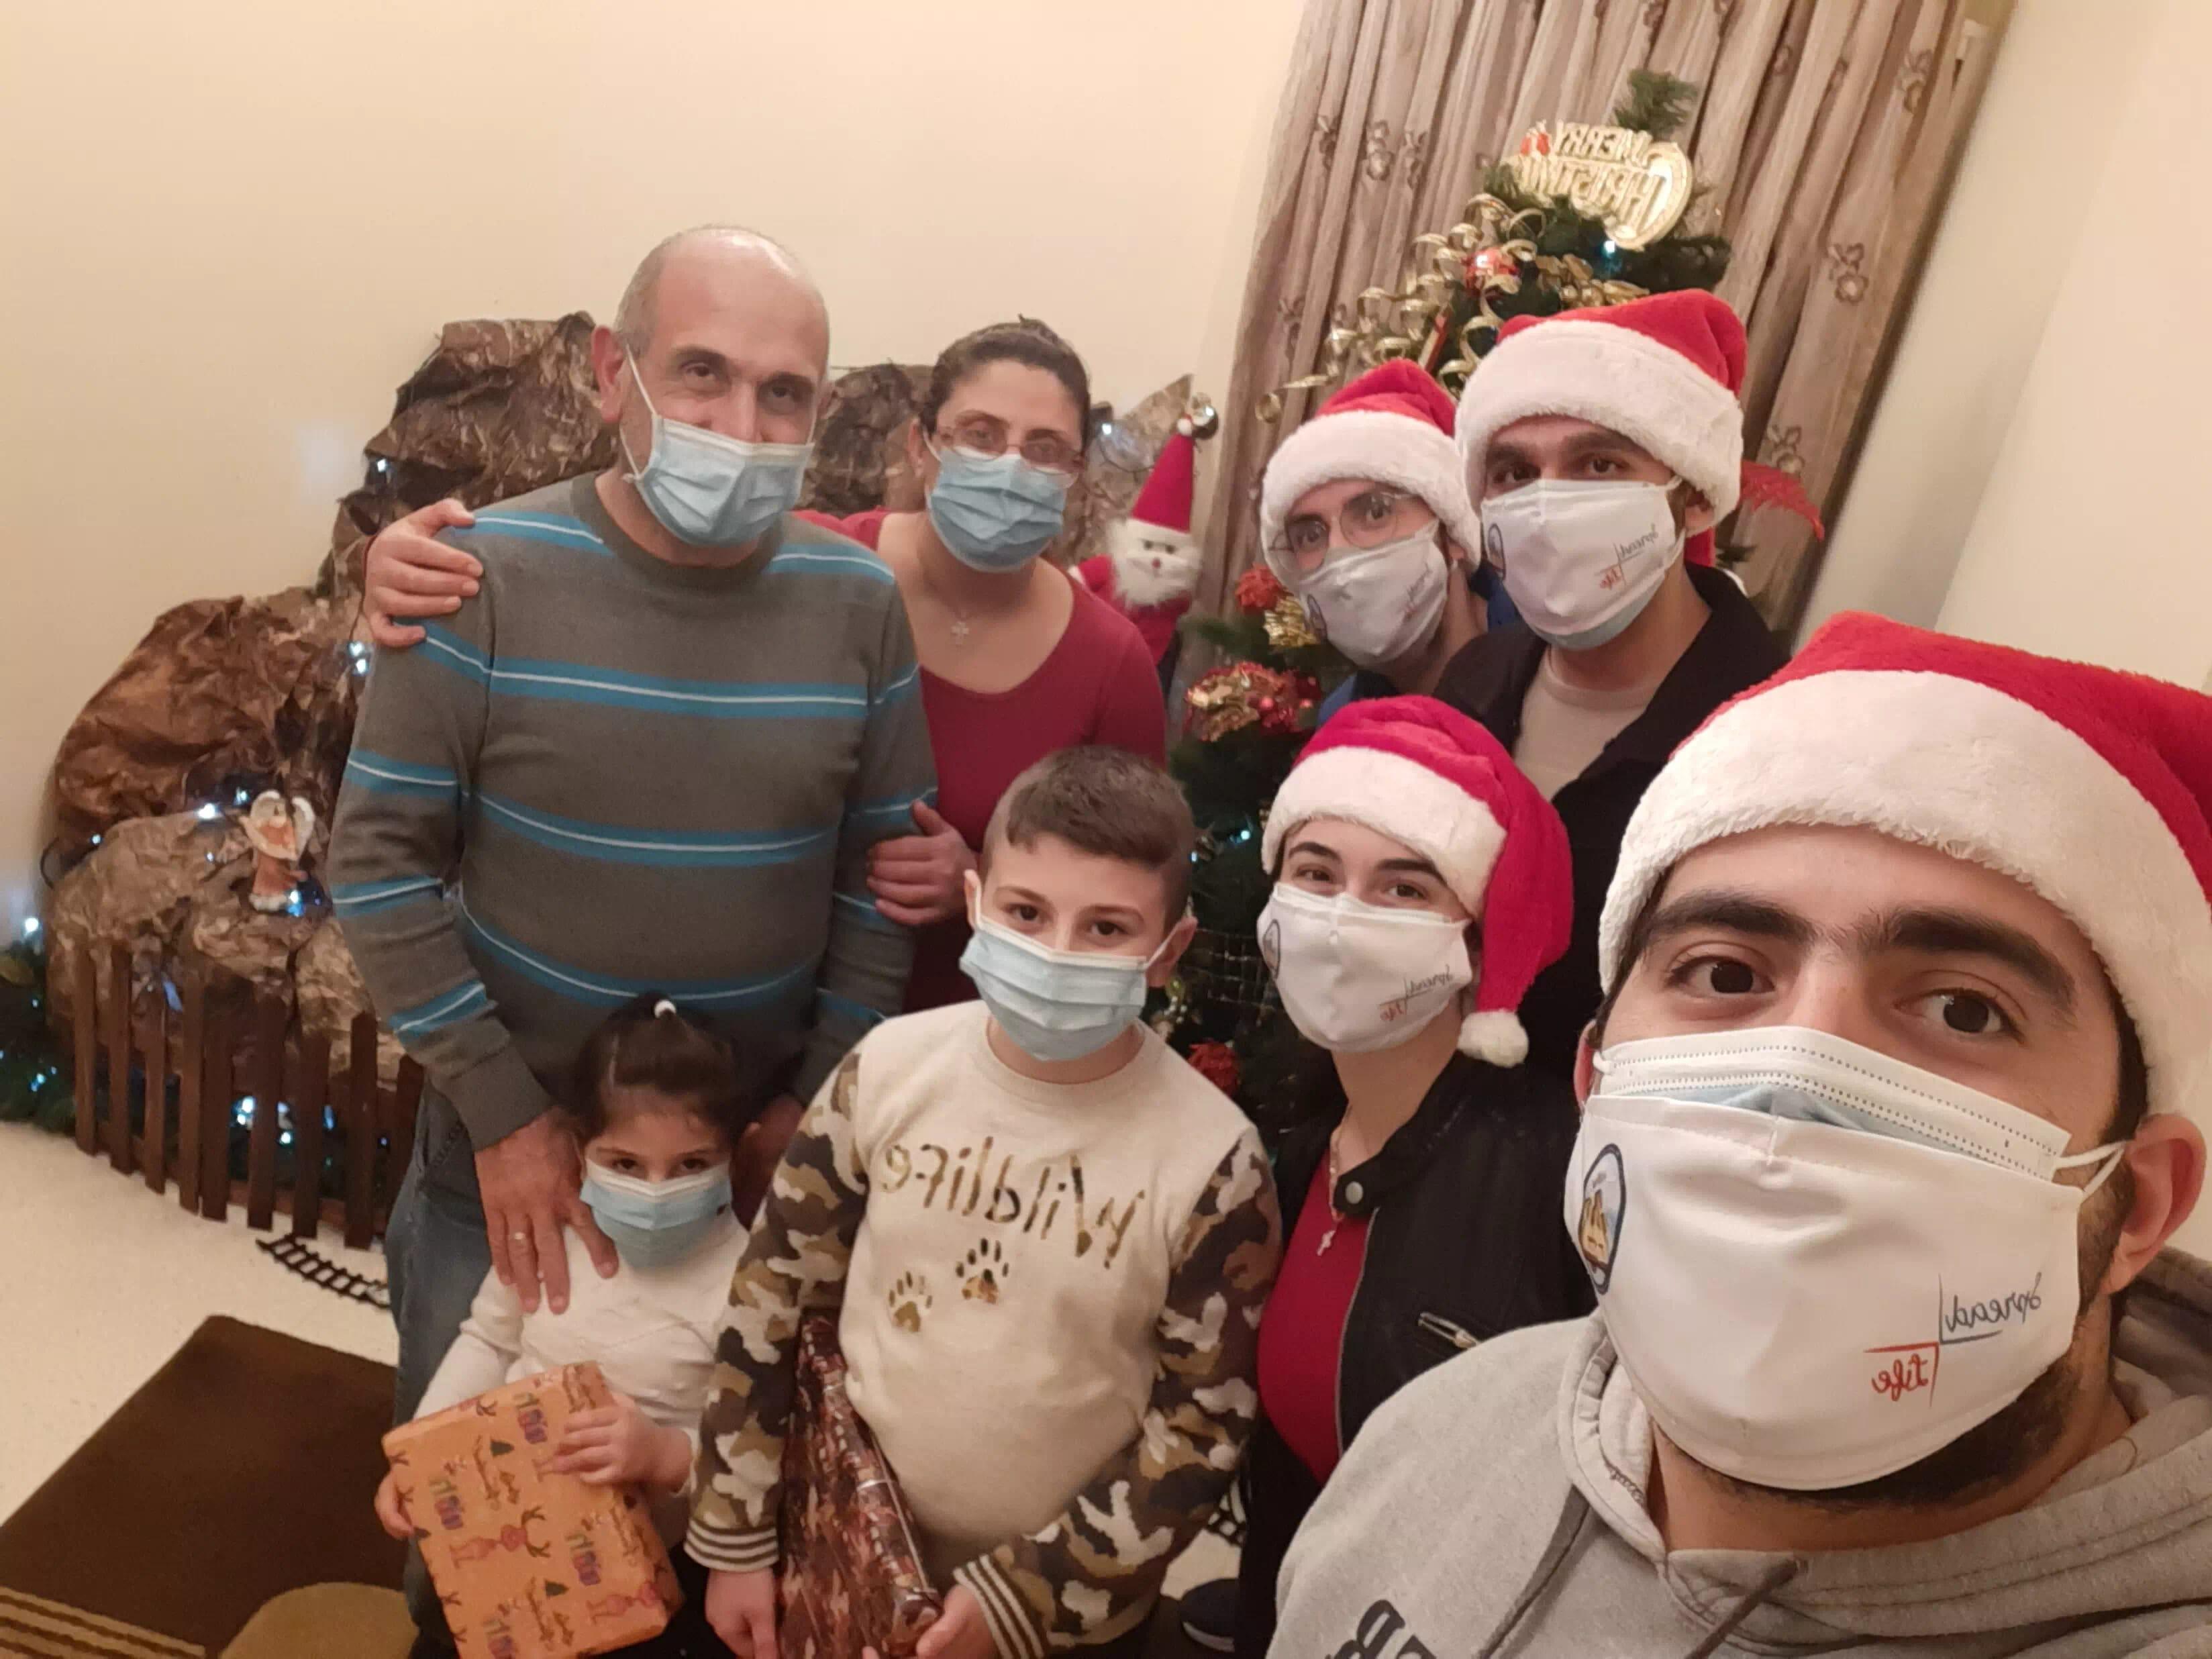 https://eundemia.sirv.com/Images/christmas/456830.webp